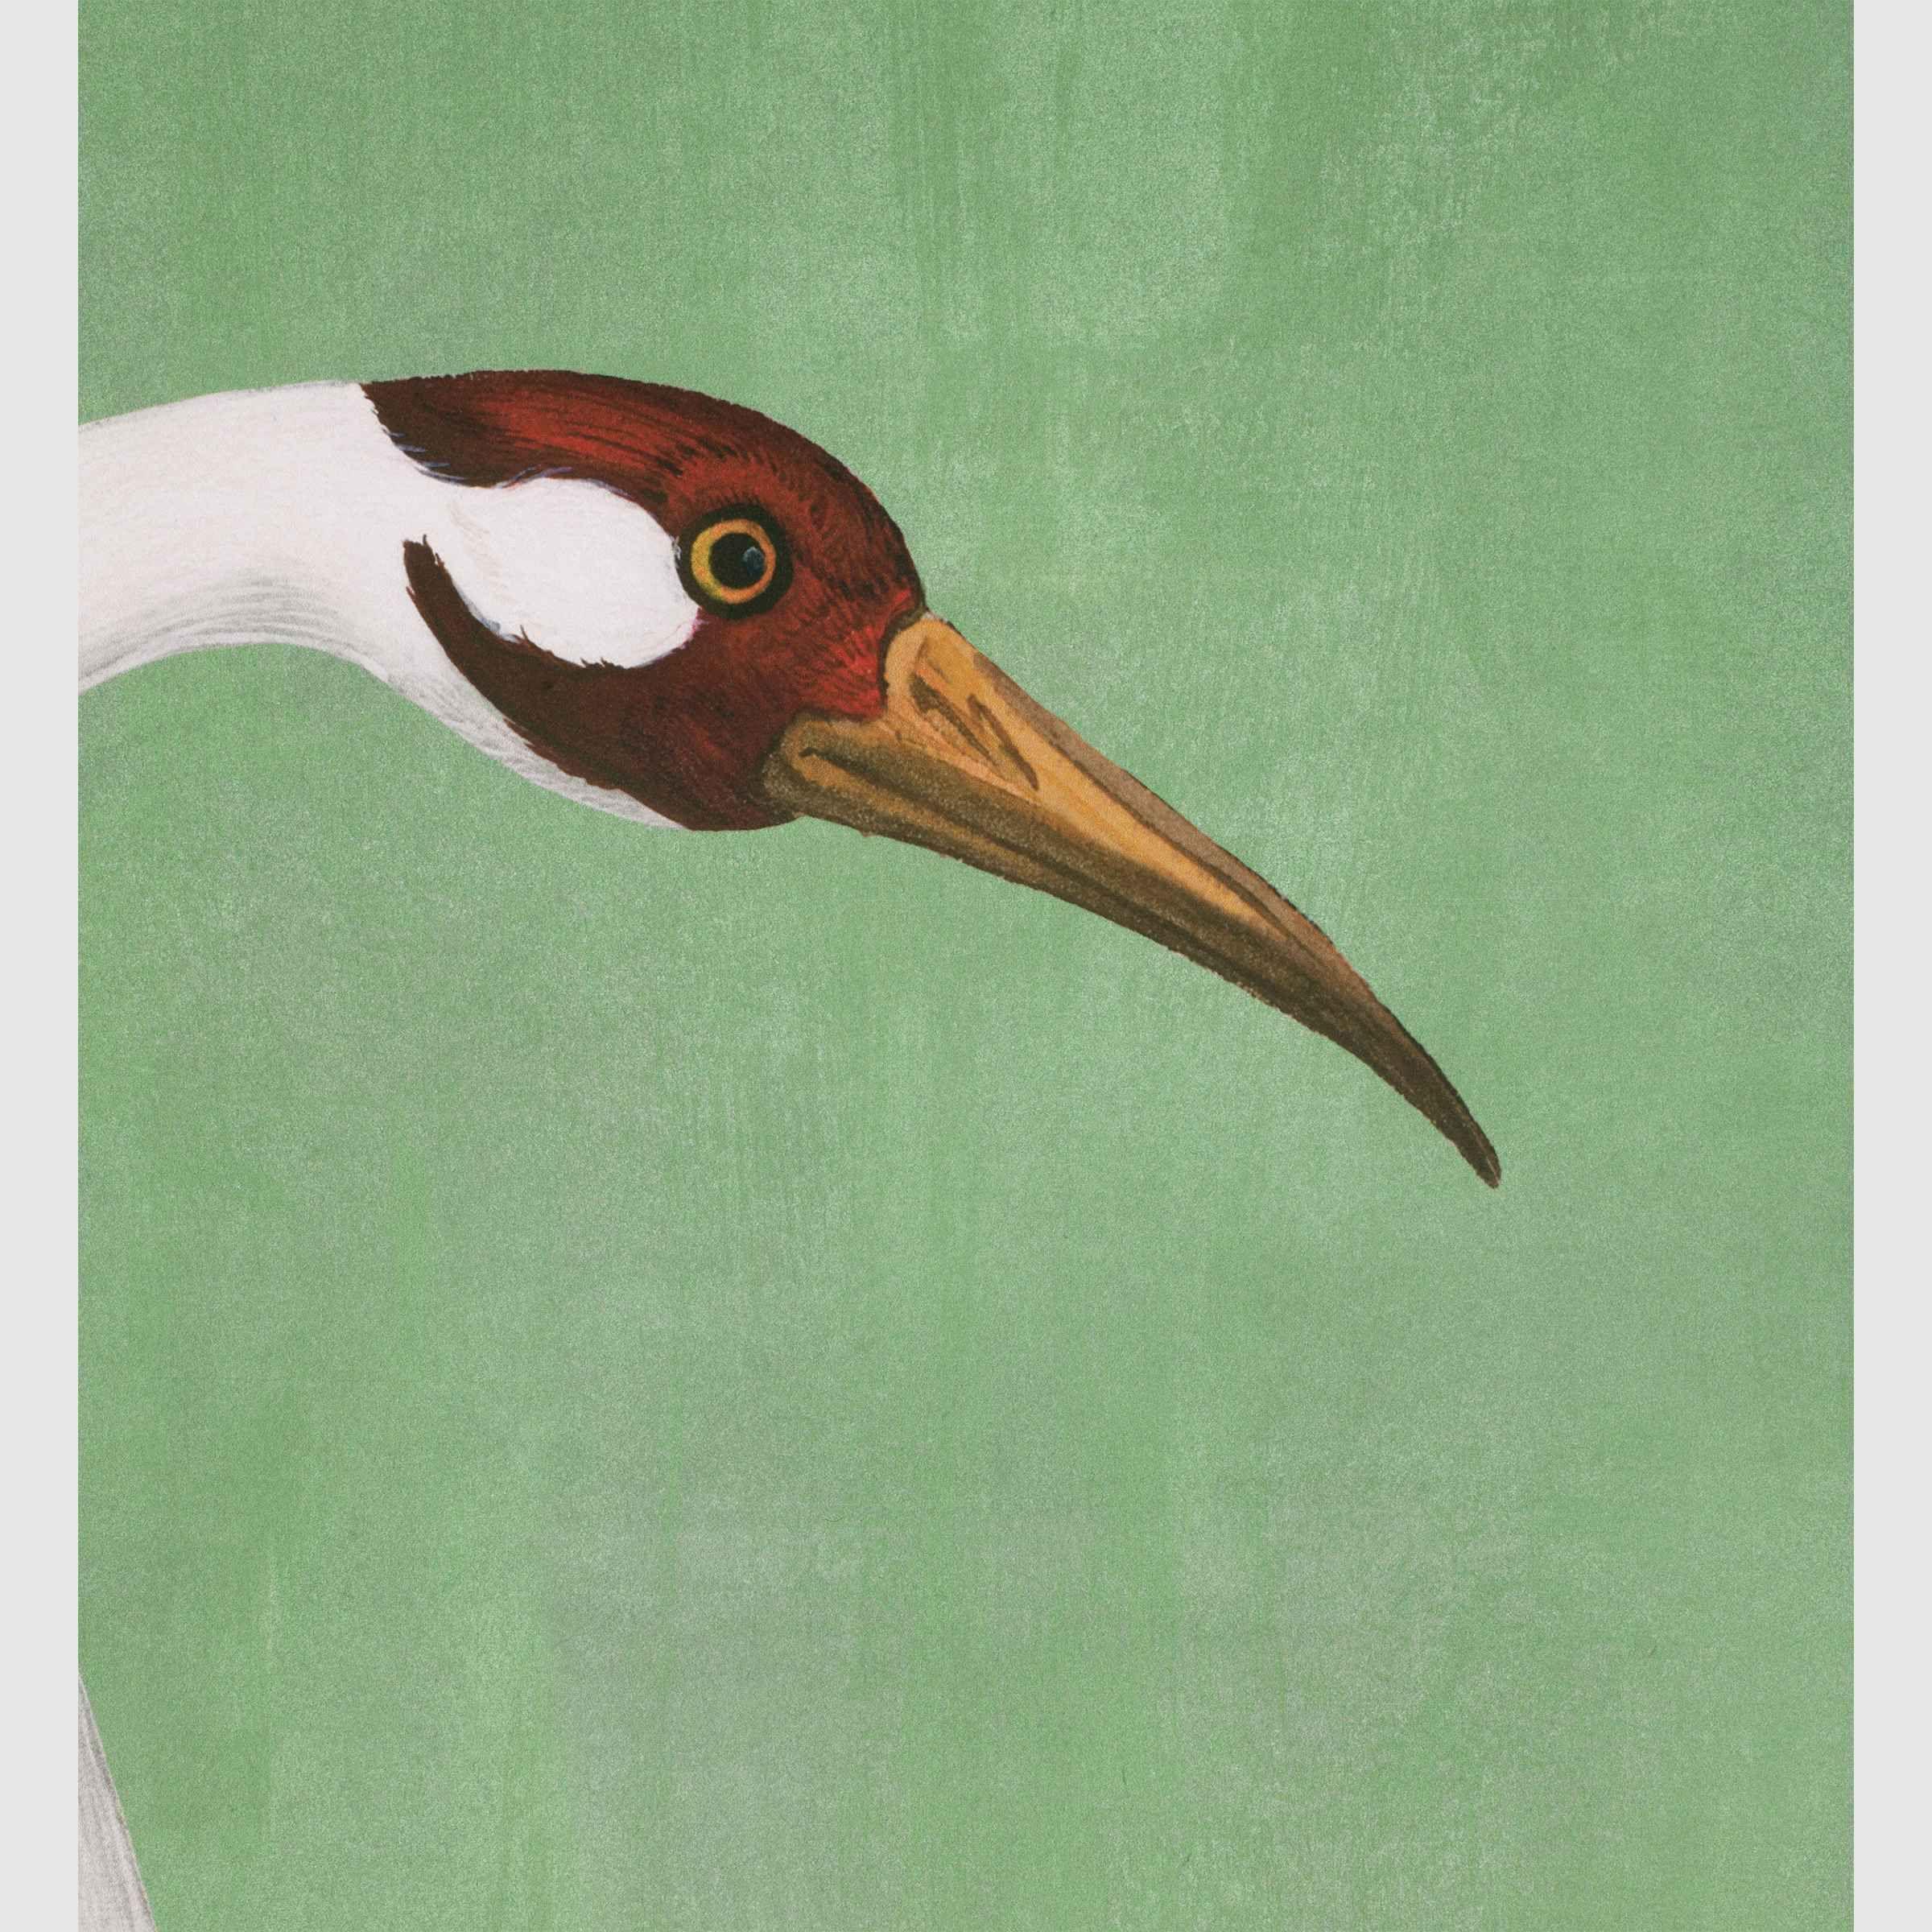 Shop the Green Heron Print Wallpaper at Enjoy